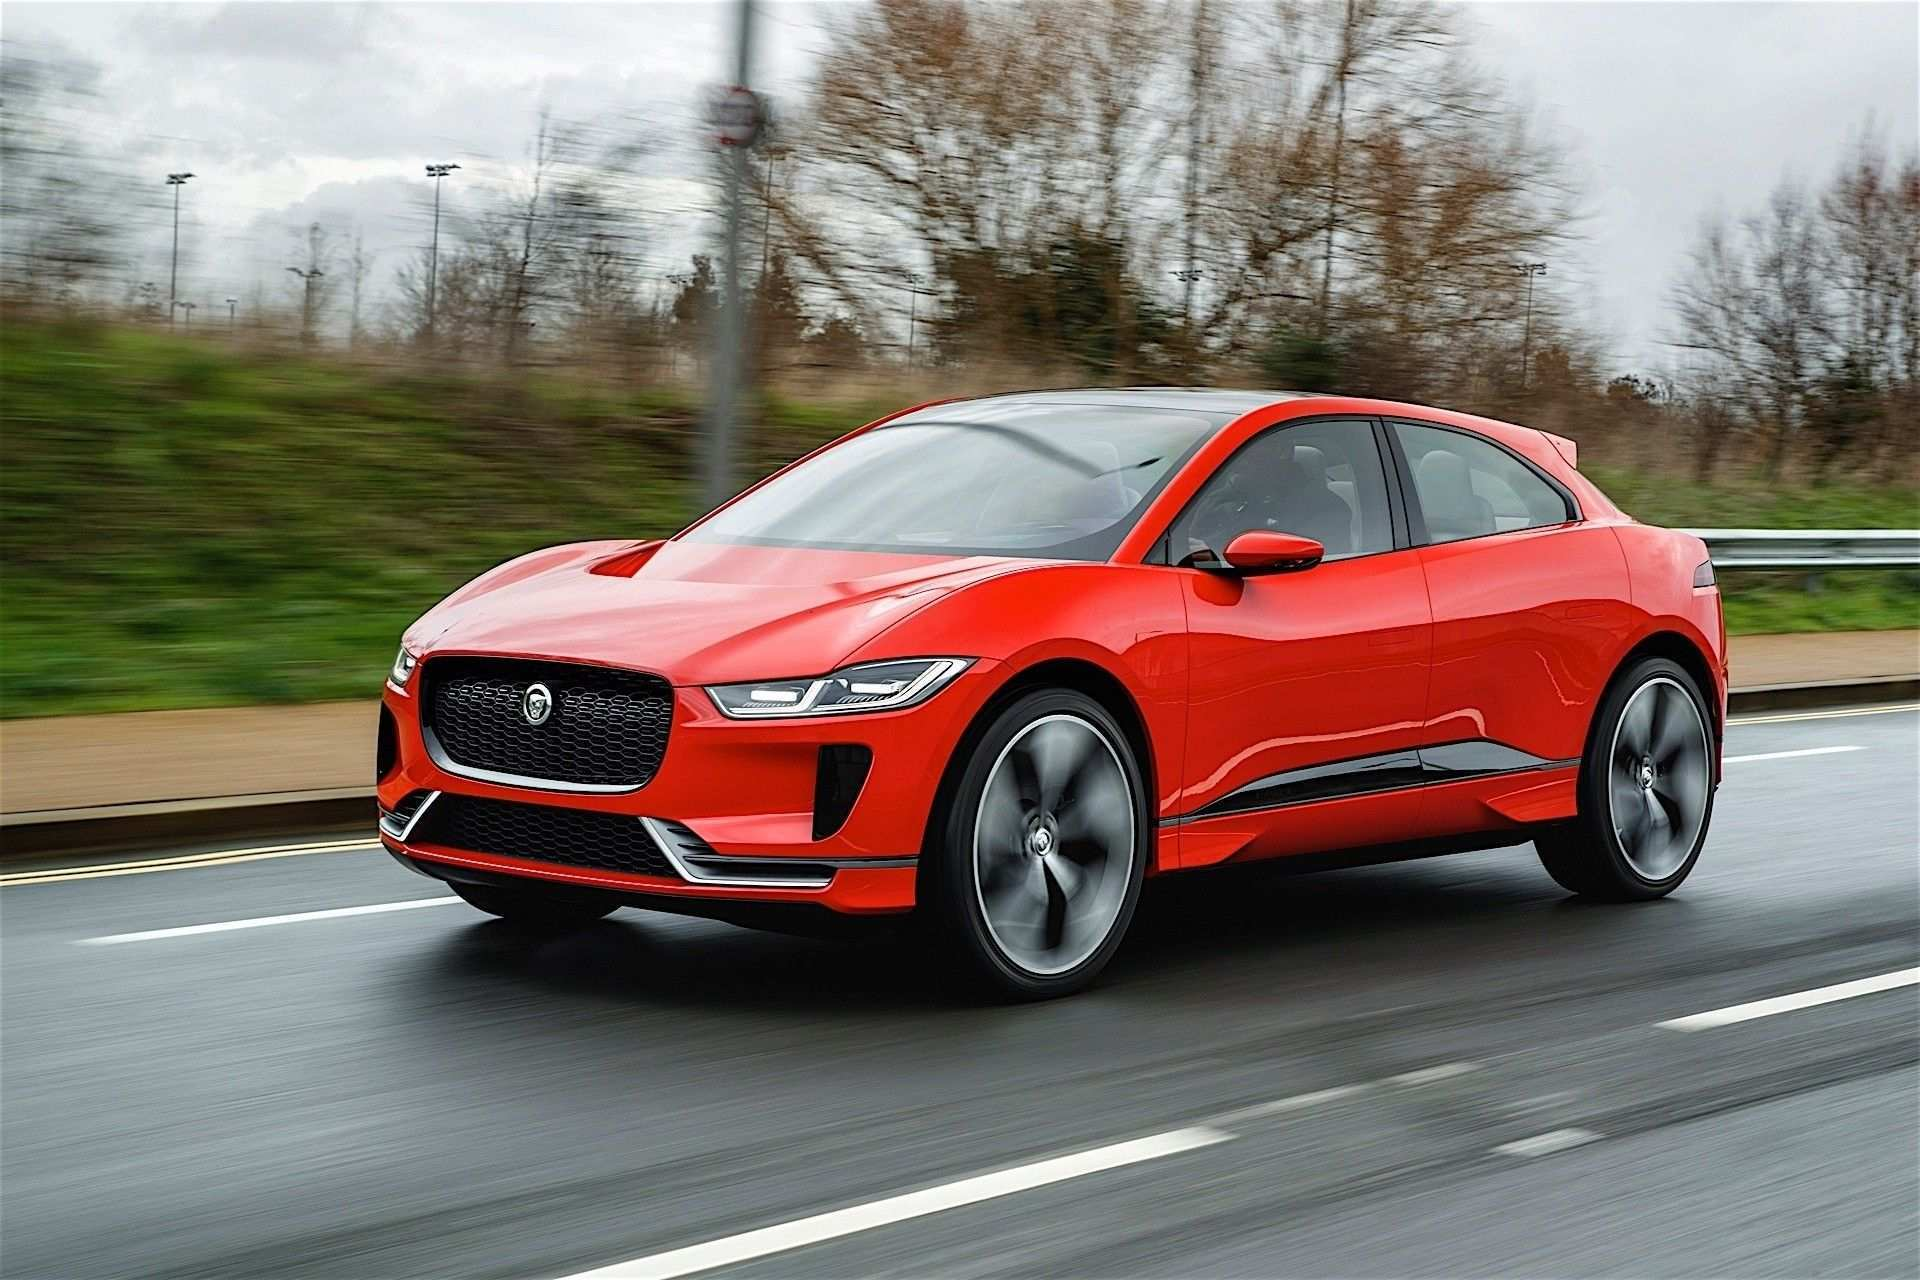 2020 Jaguar Xq Crossover Pictures